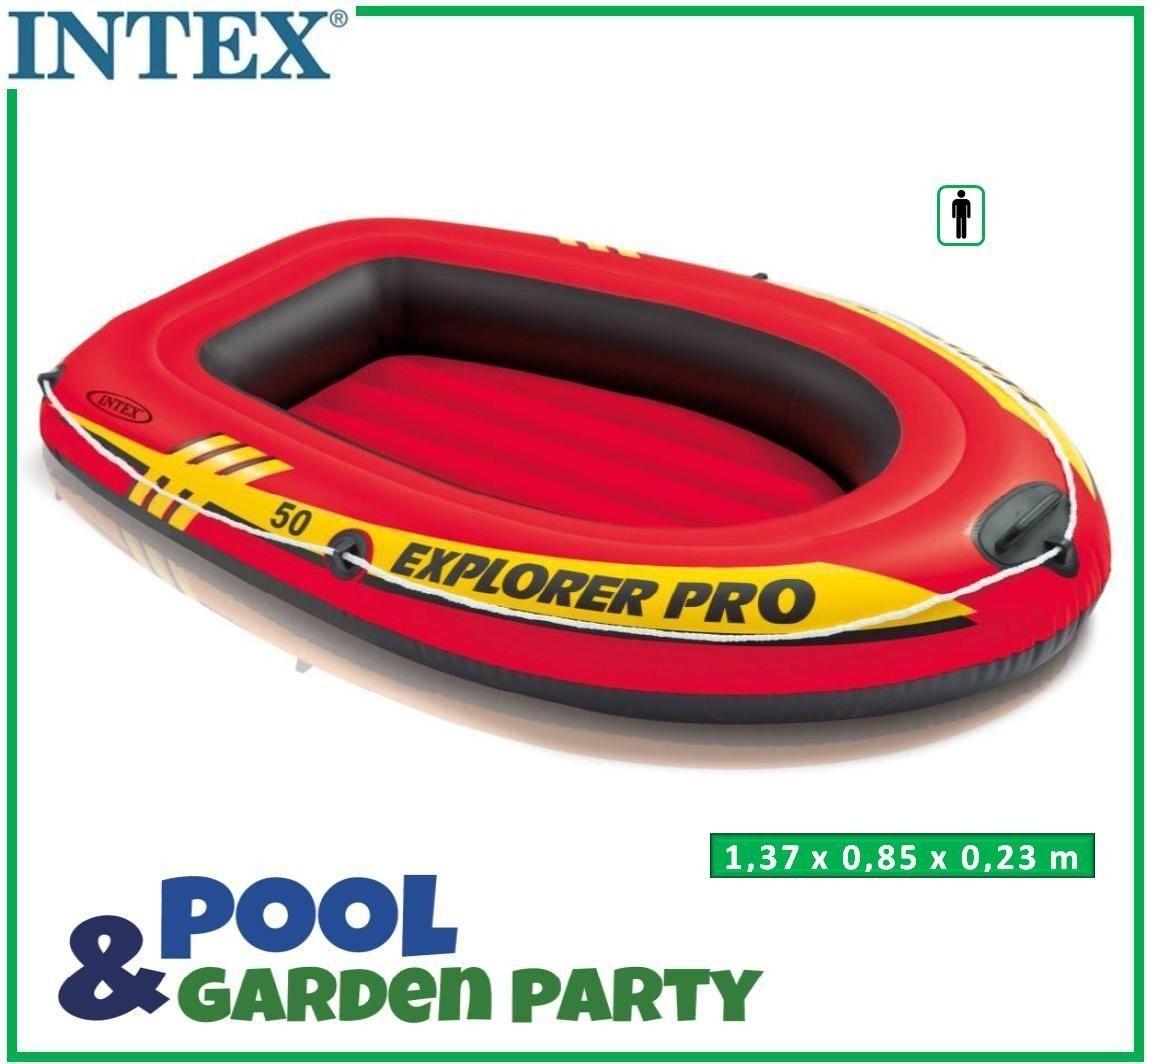 Ponton Explorer PRO 50 137 x 85 x 23 cm INTEX 58354